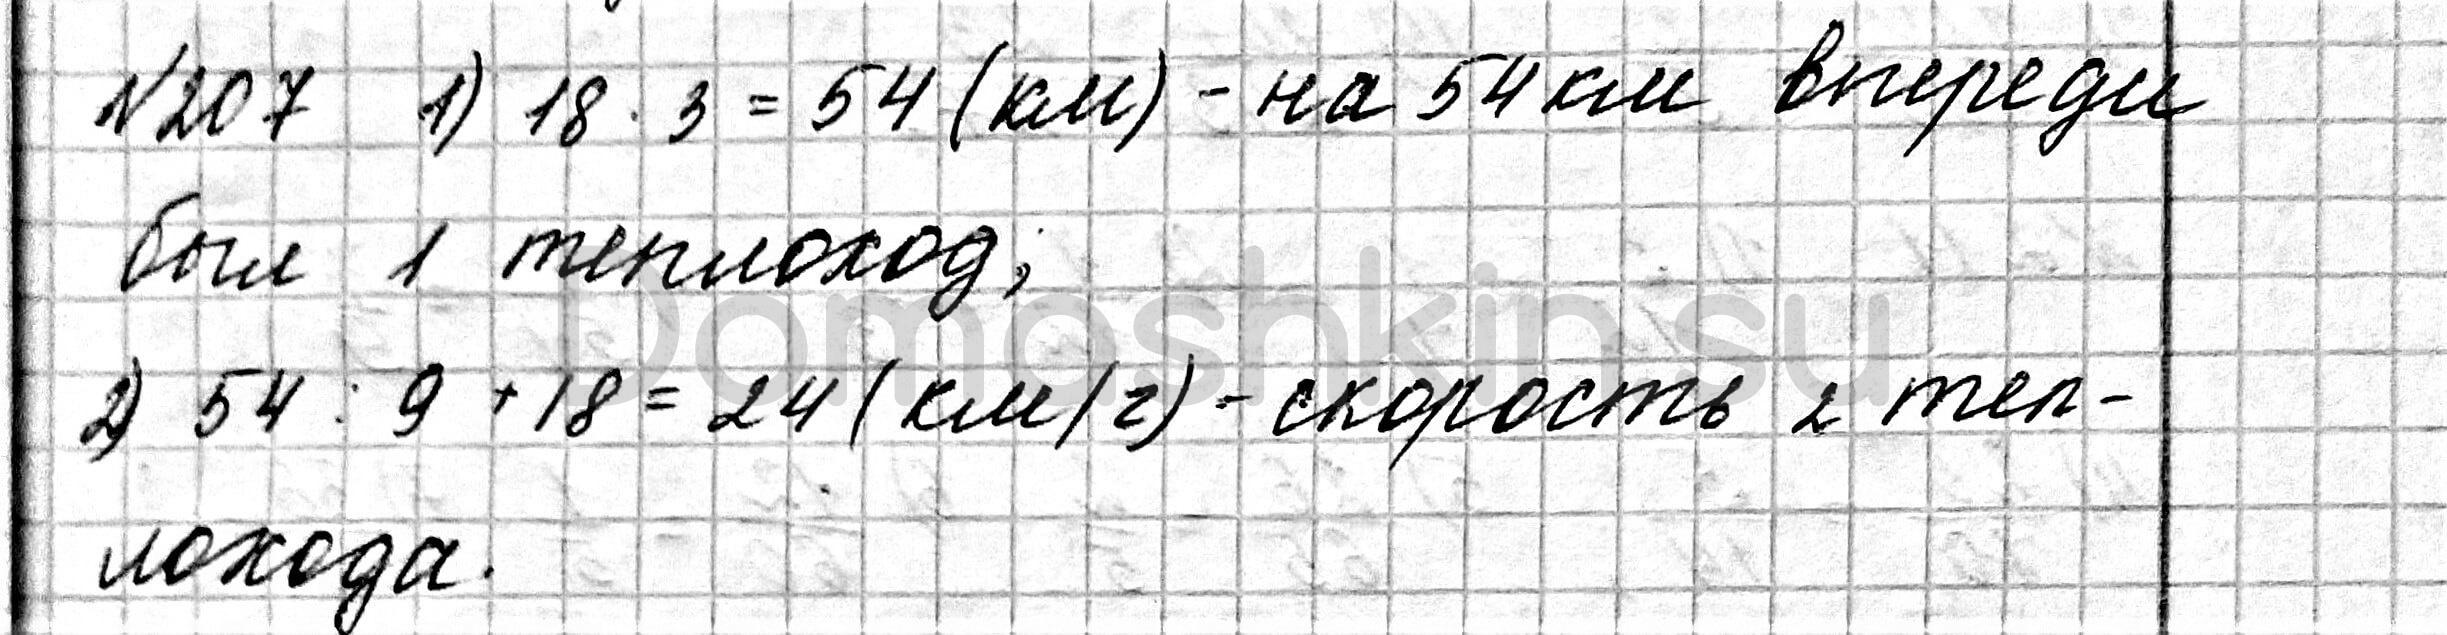 Математика 6 класс учебник Мерзляк номер 207 решение